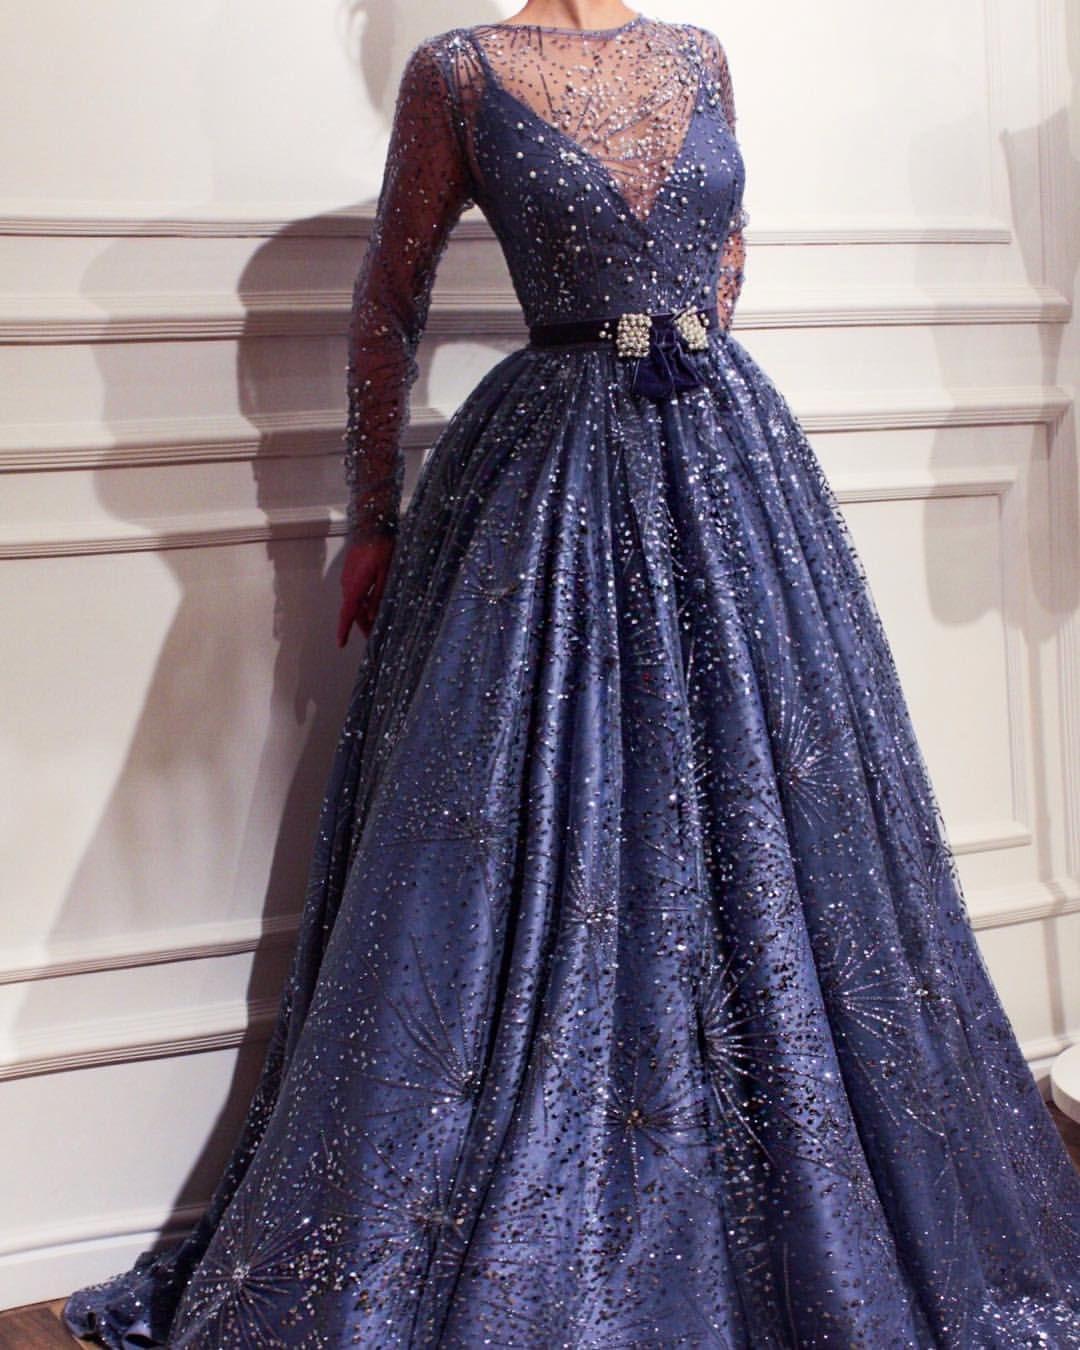 teutamatoshiduriqi  Dream Dresses in   Pinterest  Dresses